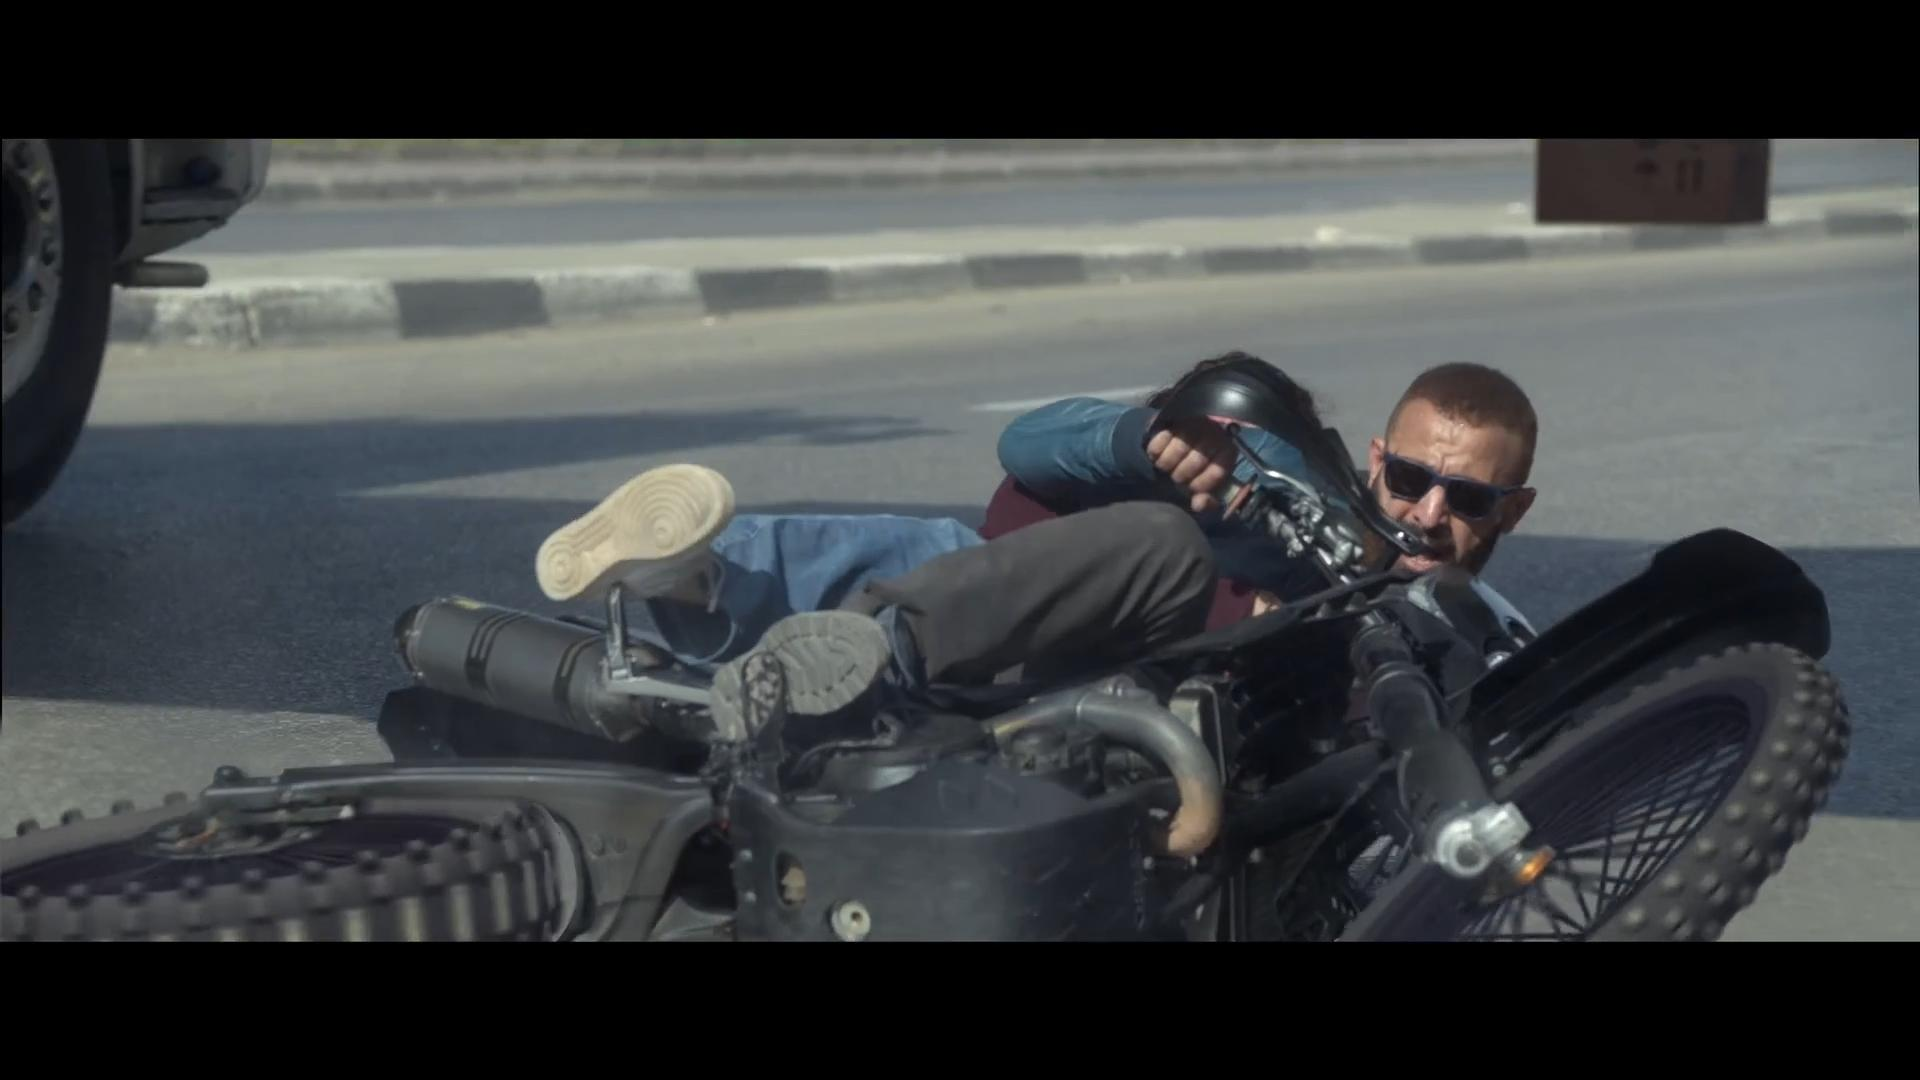 [فيلم][تورنت][تحميل][هروب اضطراري][2017][1080p][Web-DL] 11 arabp2p.com